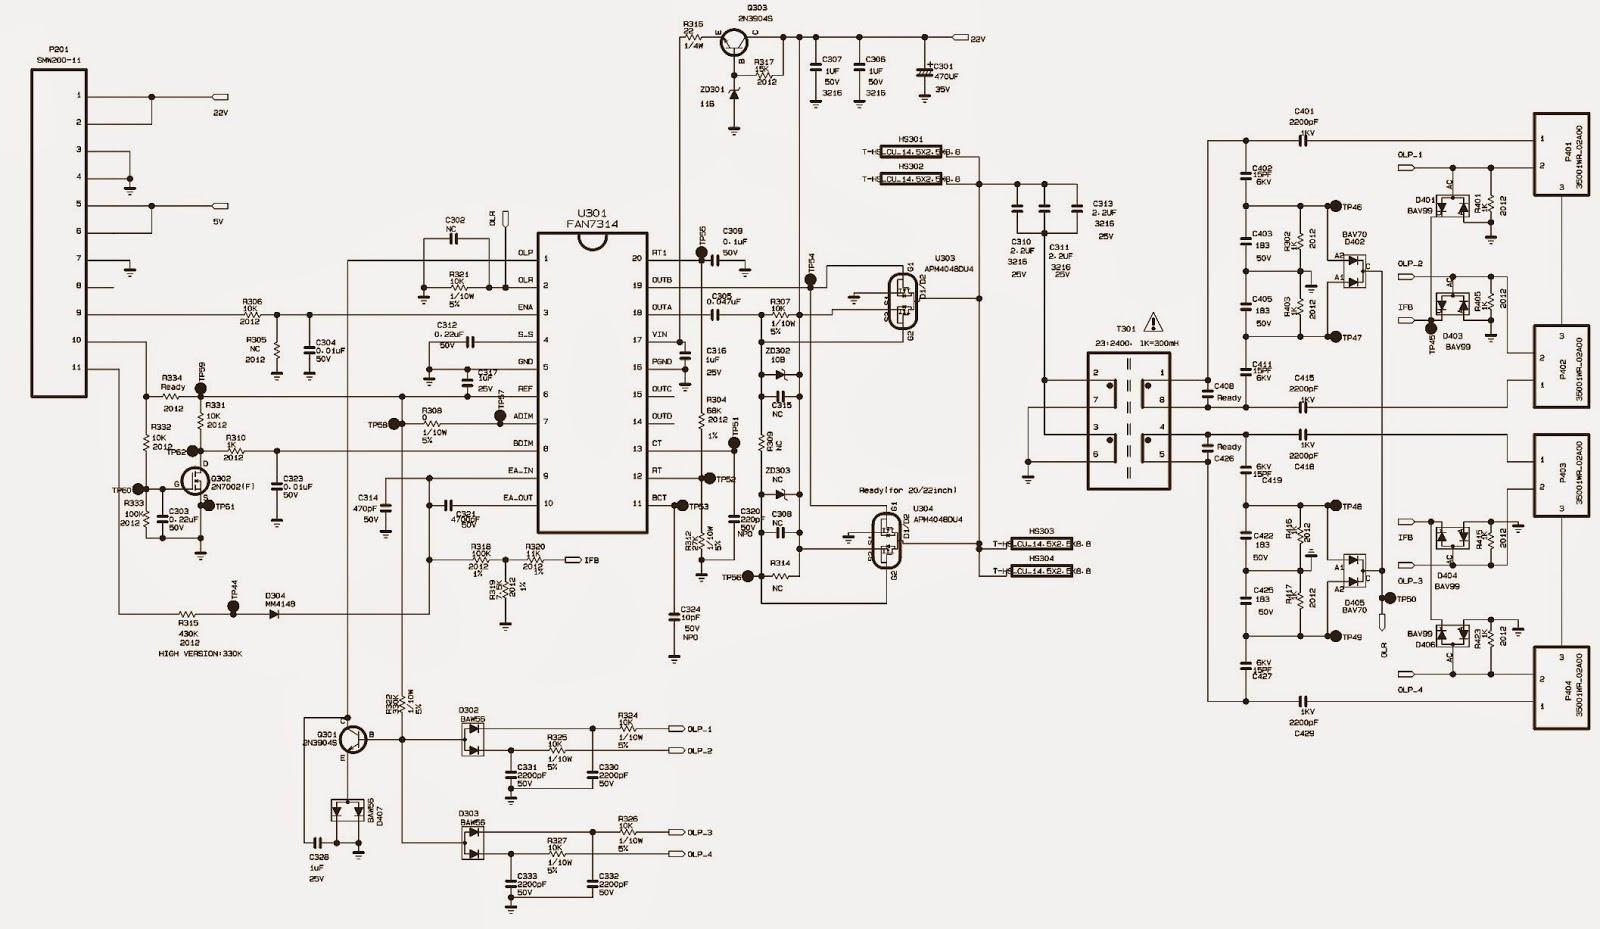 lg fridge wiring diagrams gallery lg flatron w1942s lcd monitor u2013 aocl32w831 u2013 philco28t35dg [ 1600 x 929 Pixel ]